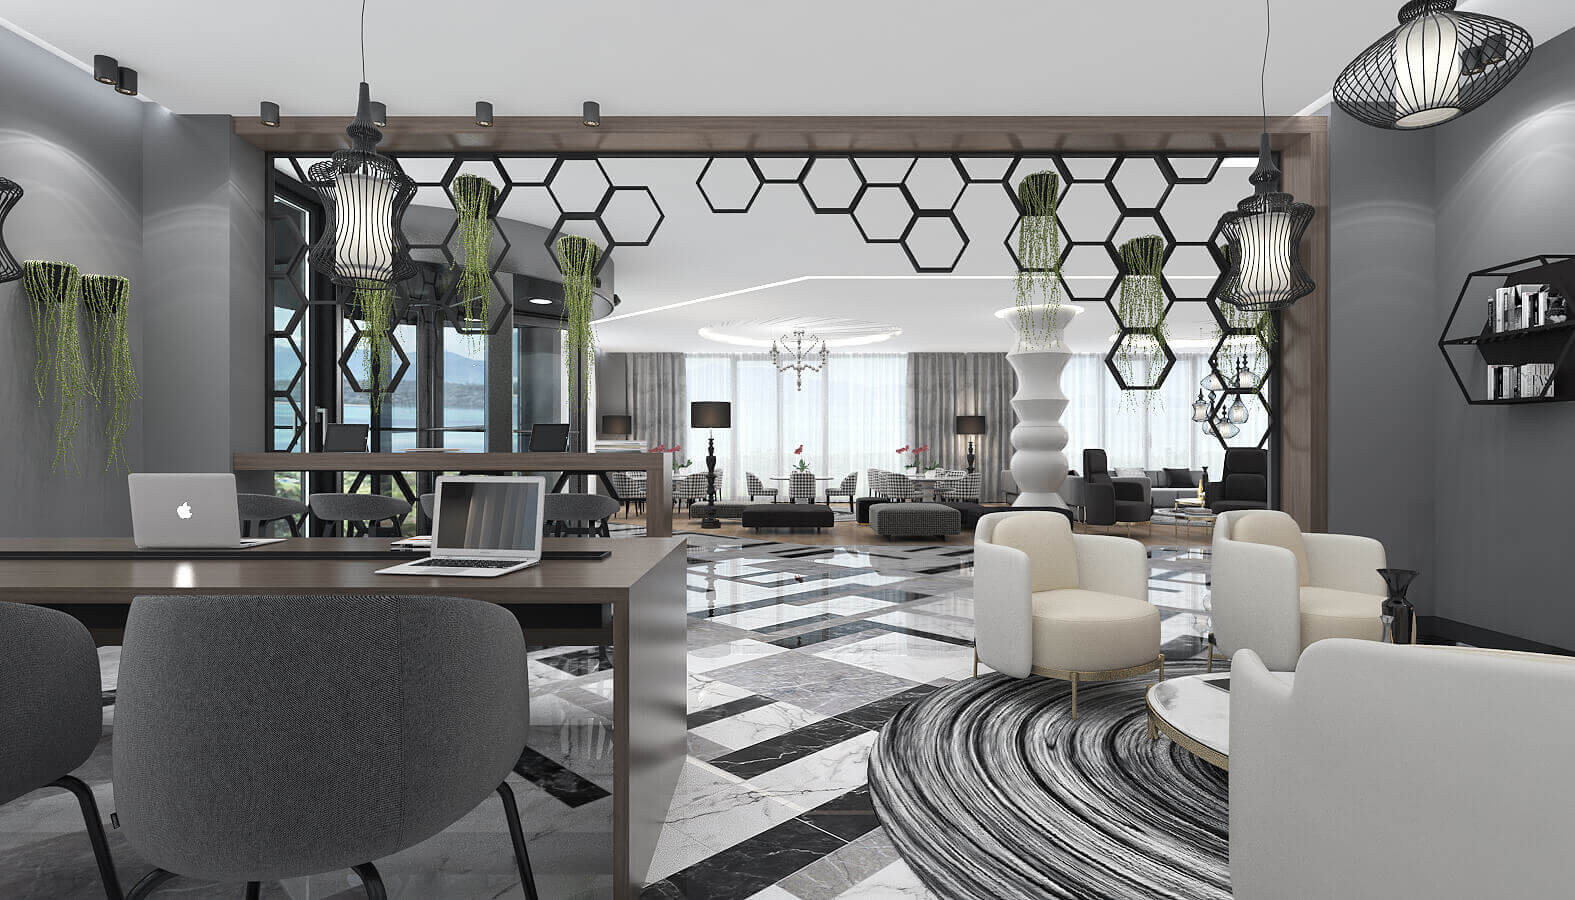 Lobby design 3597 Dogruer hotel Hotels